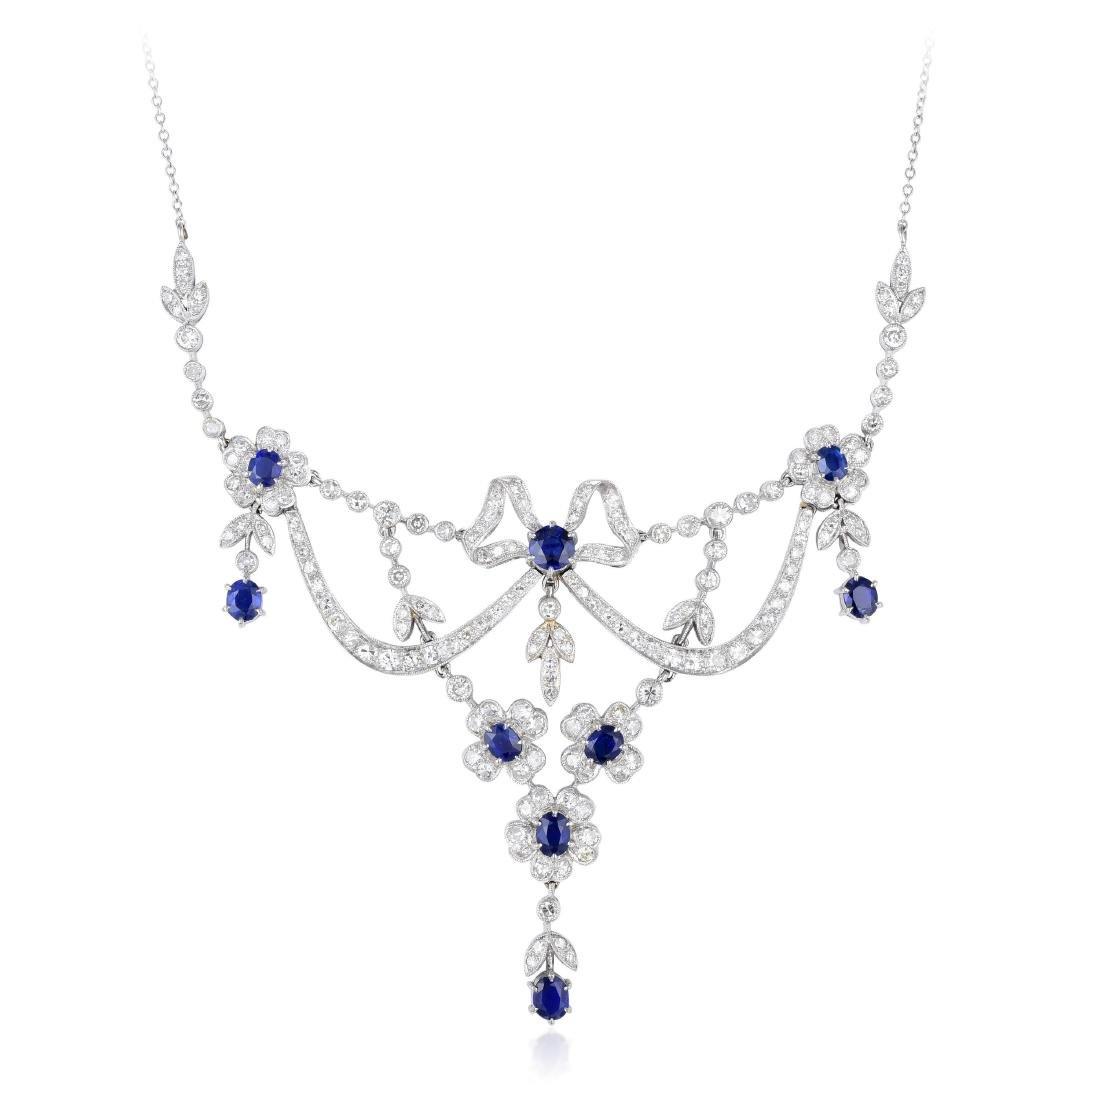 A Platinum Diamond and Sapphire Garland Necklace